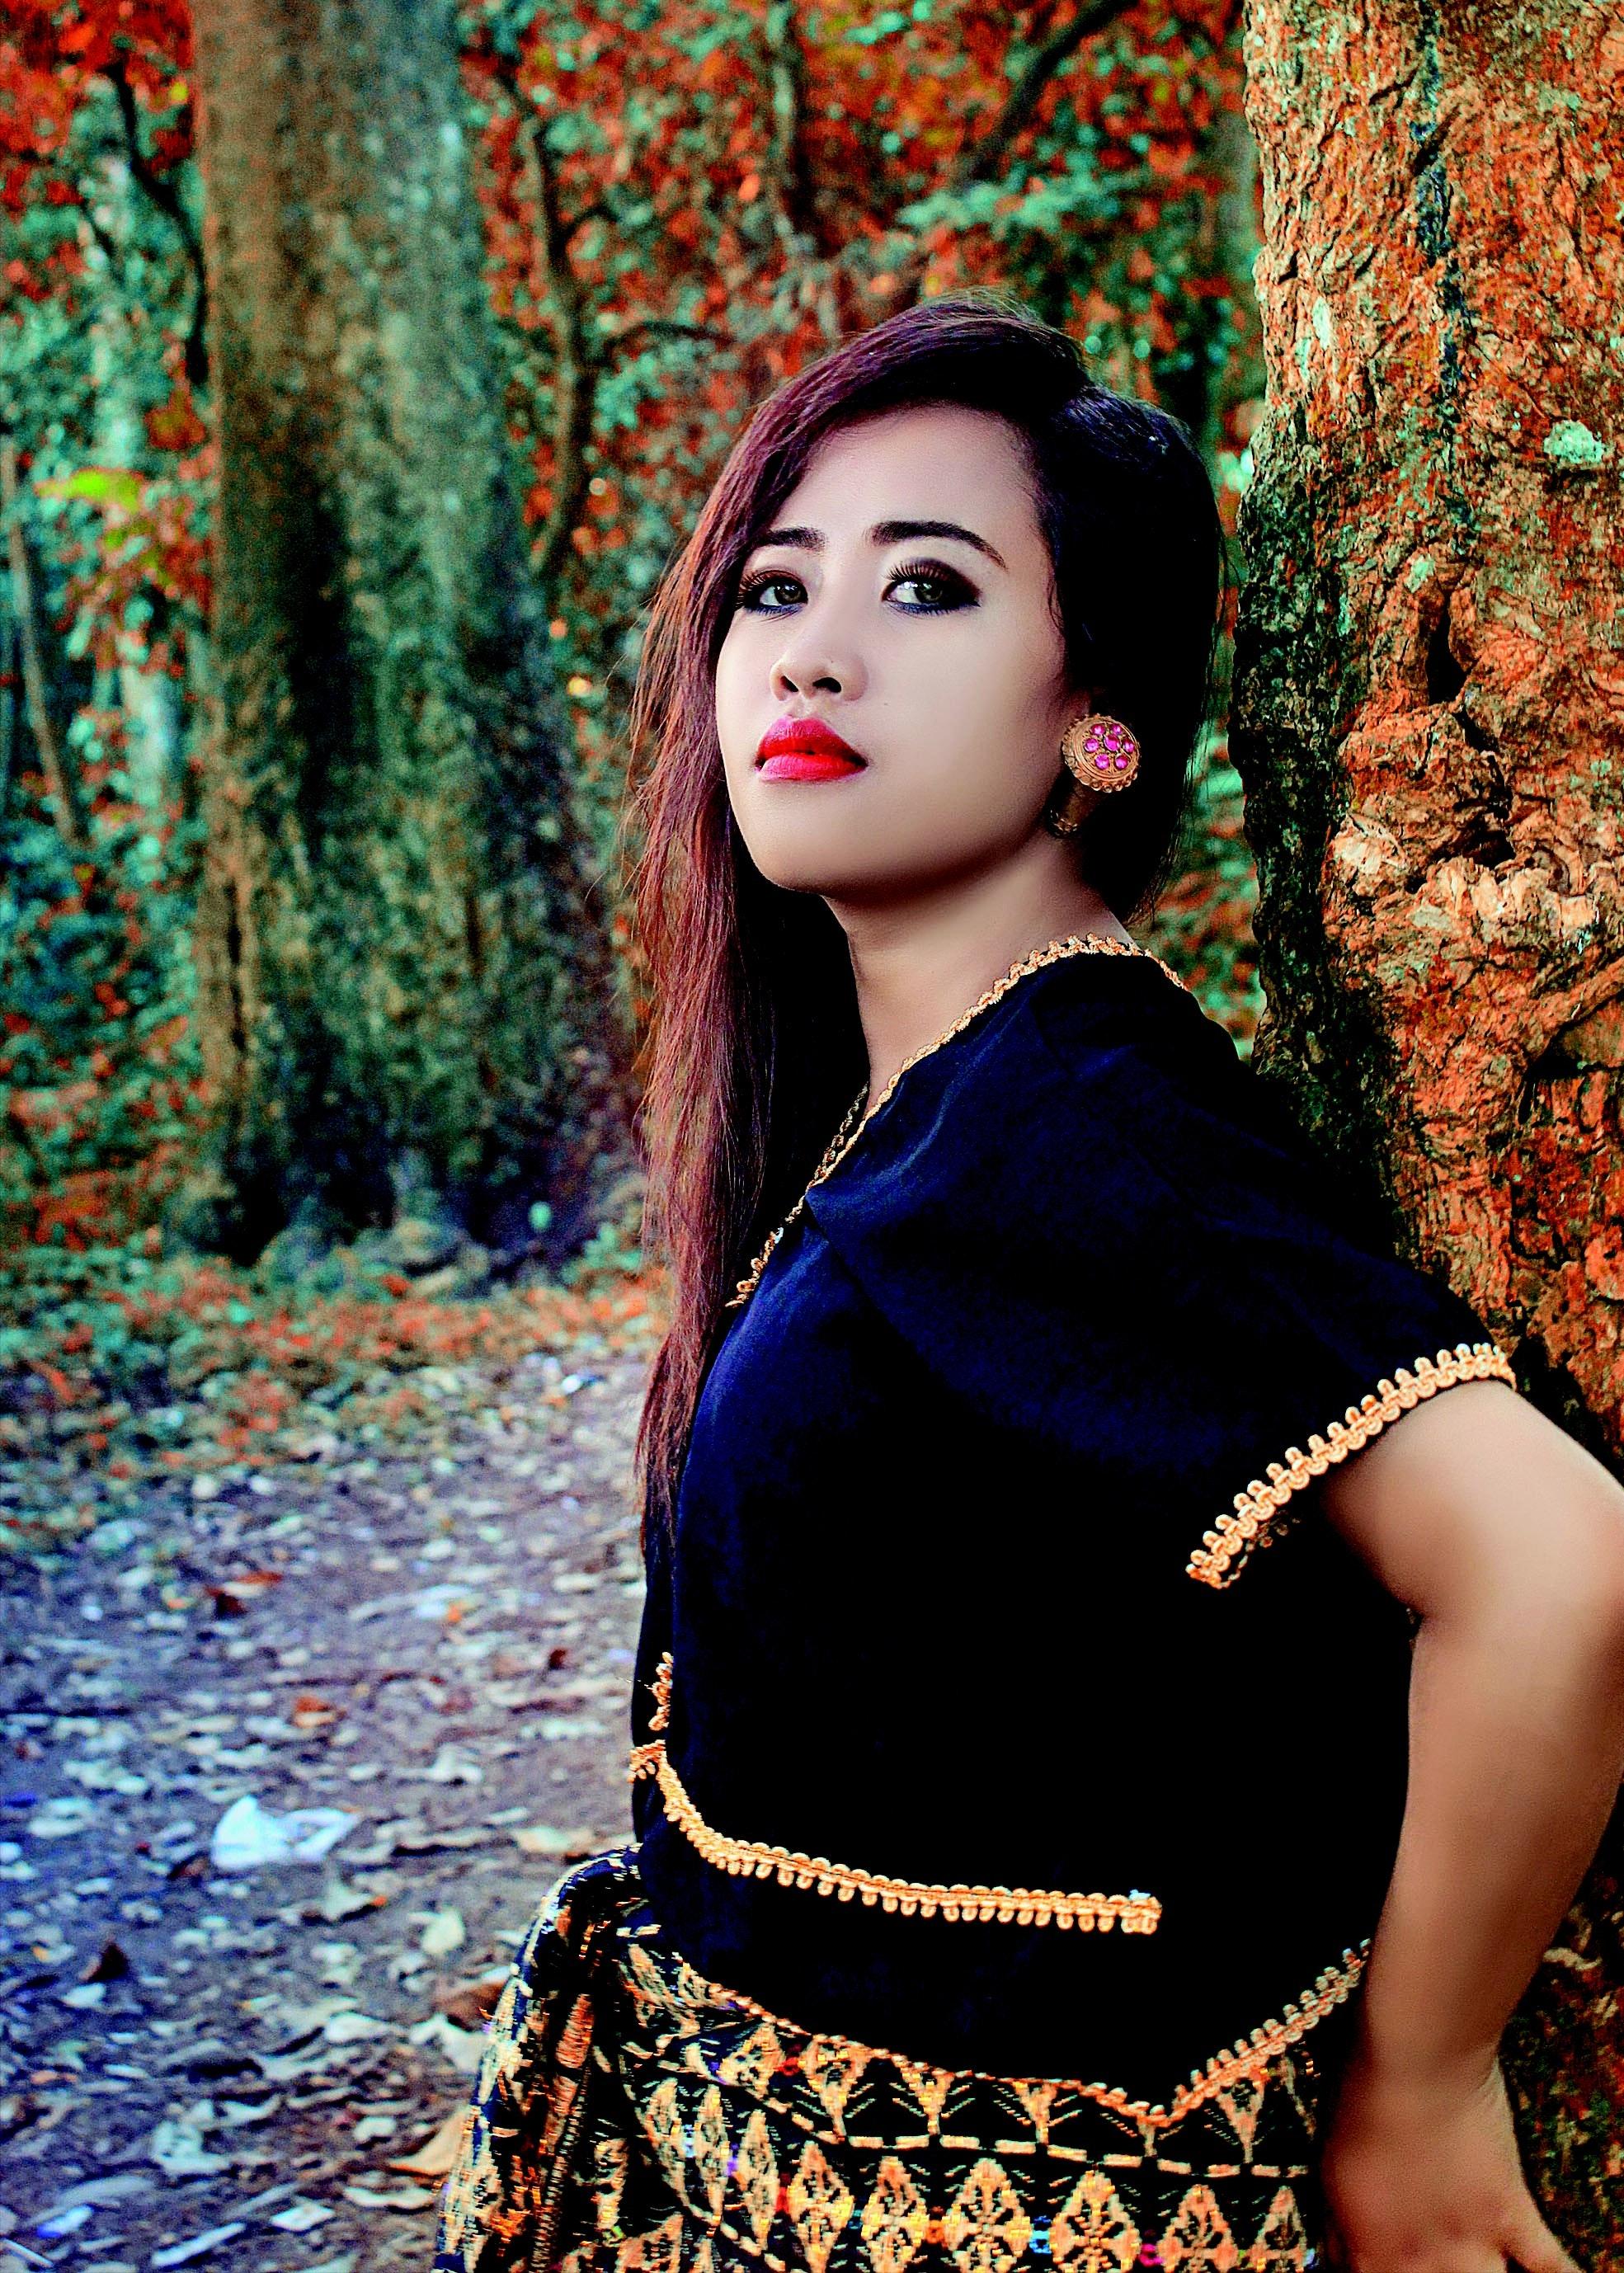 Asian model photo woman final